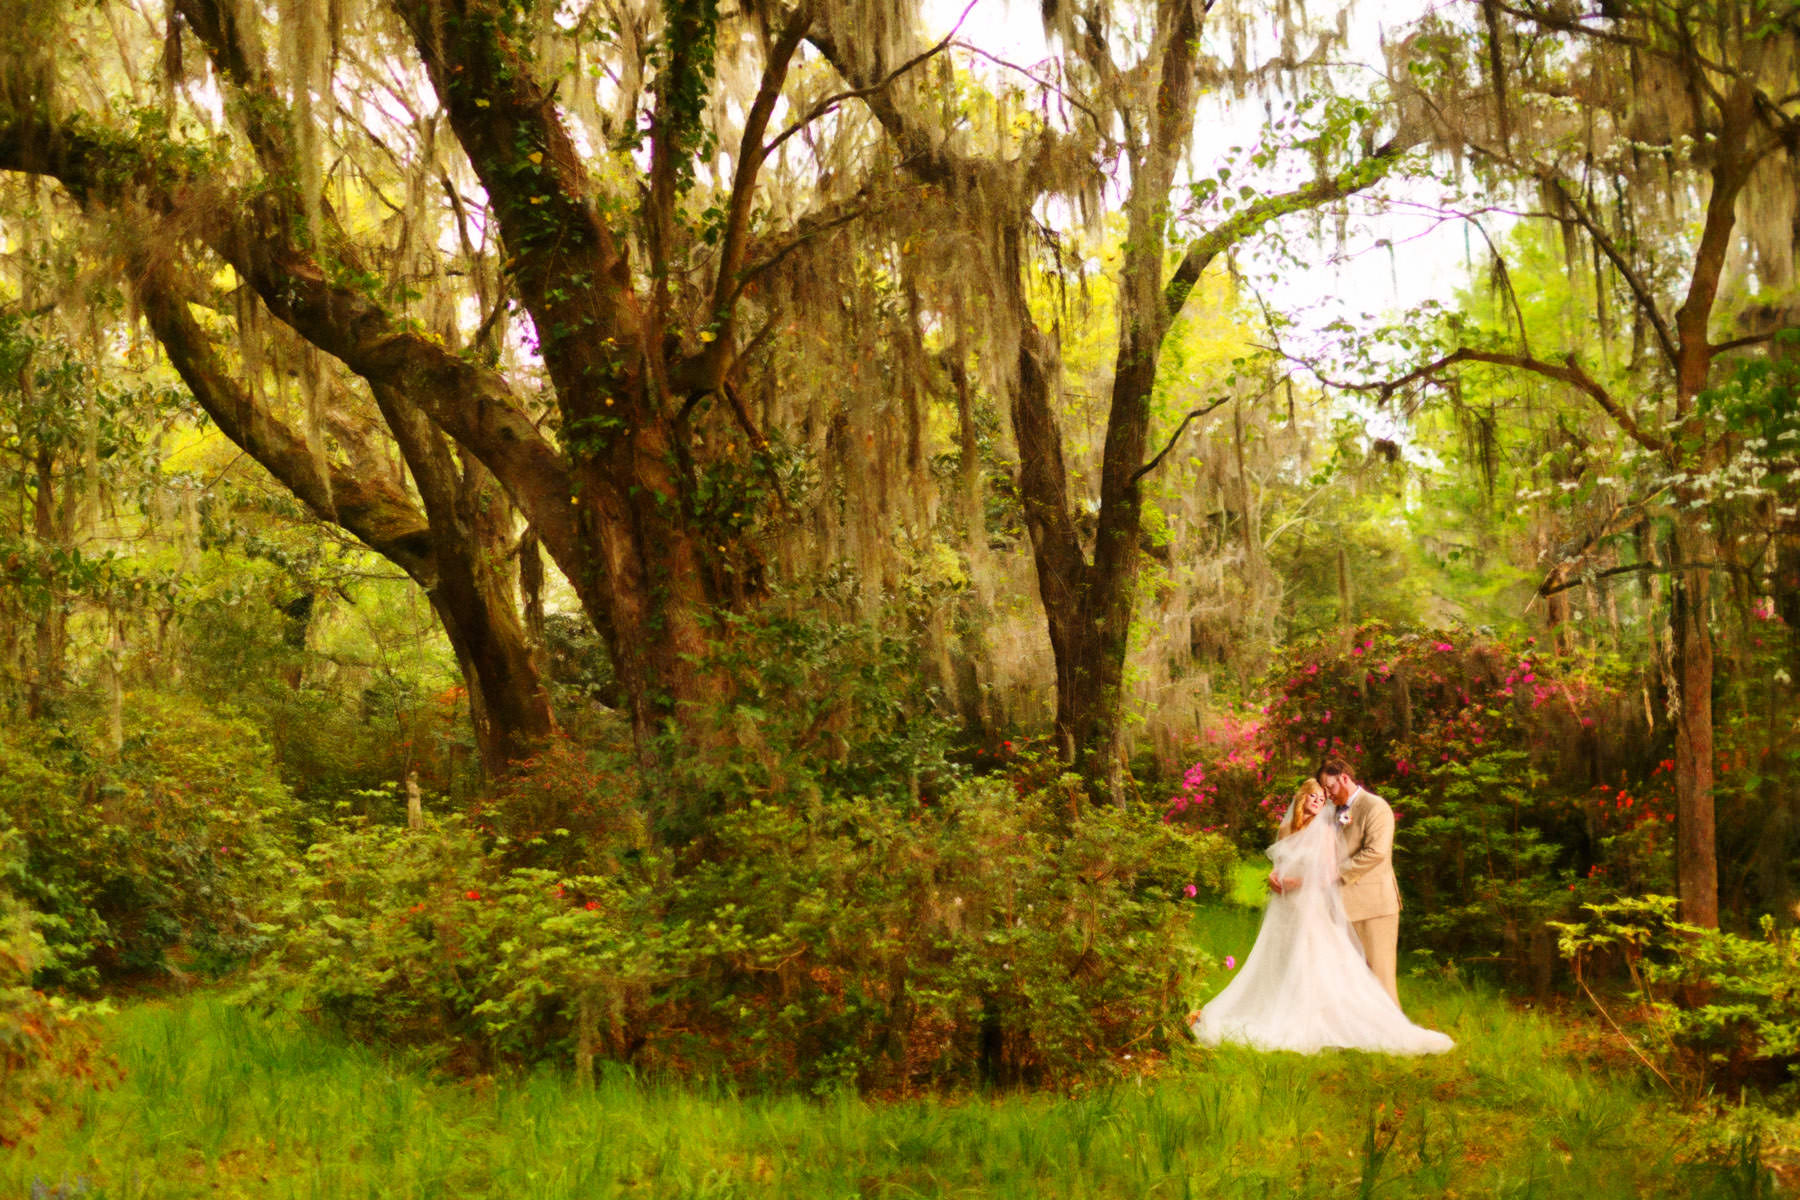 rm_brown_wedding_174paint2